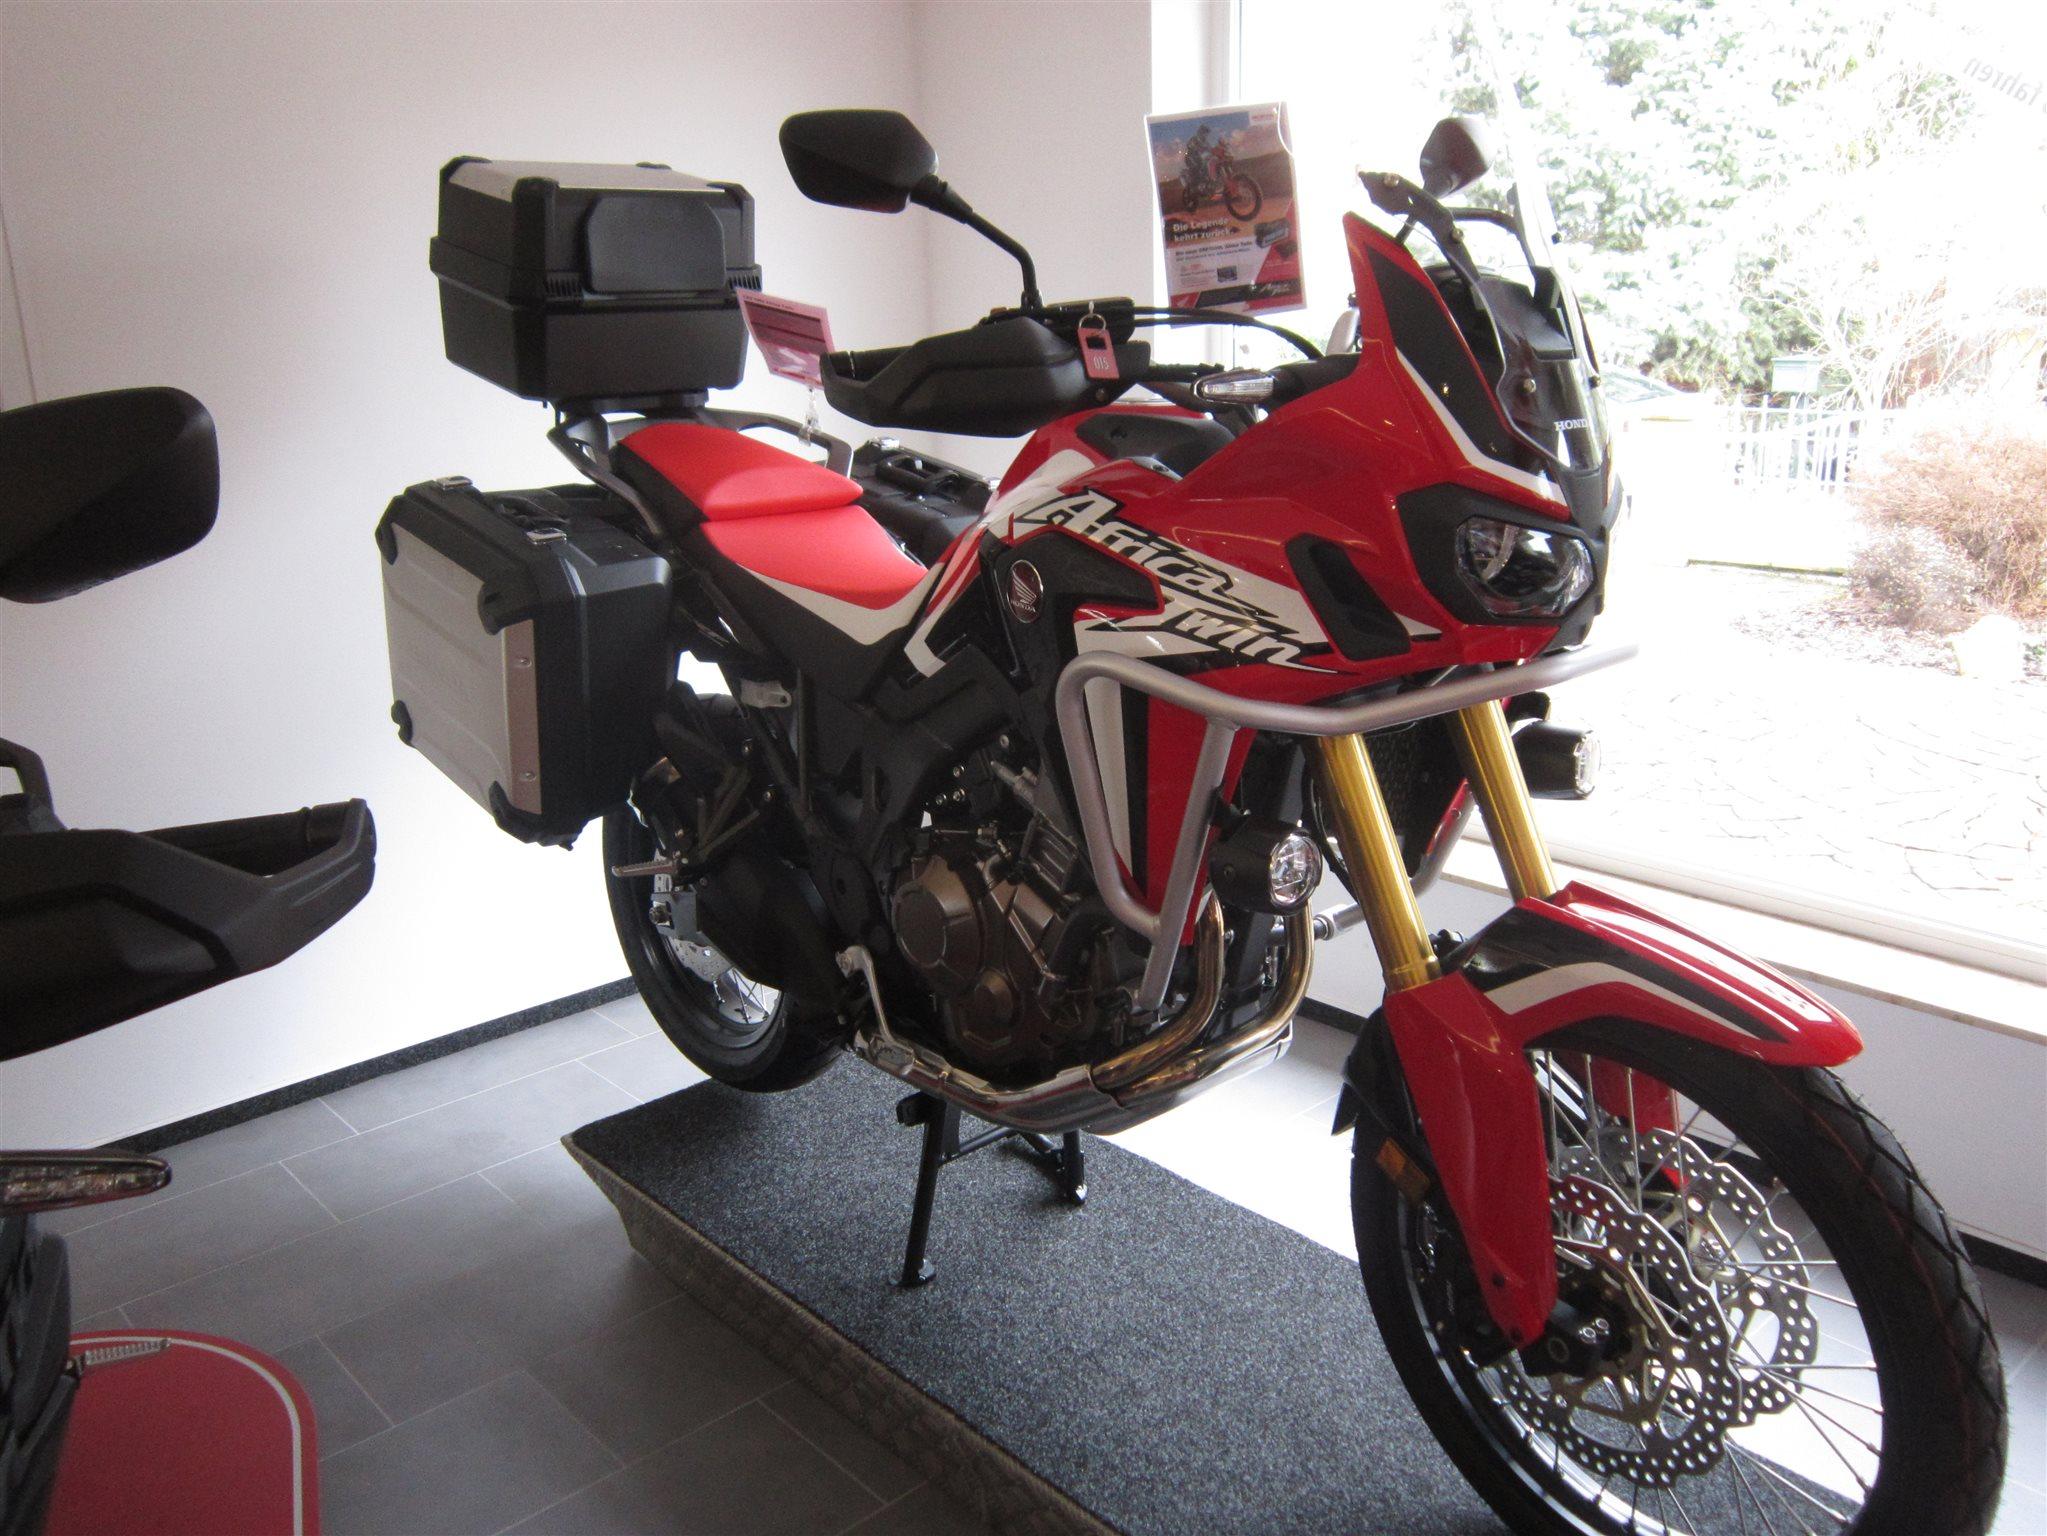 umgebautes motorrad honda crf1000l africa twin von. Black Bedroom Furniture Sets. Home Design Ideas